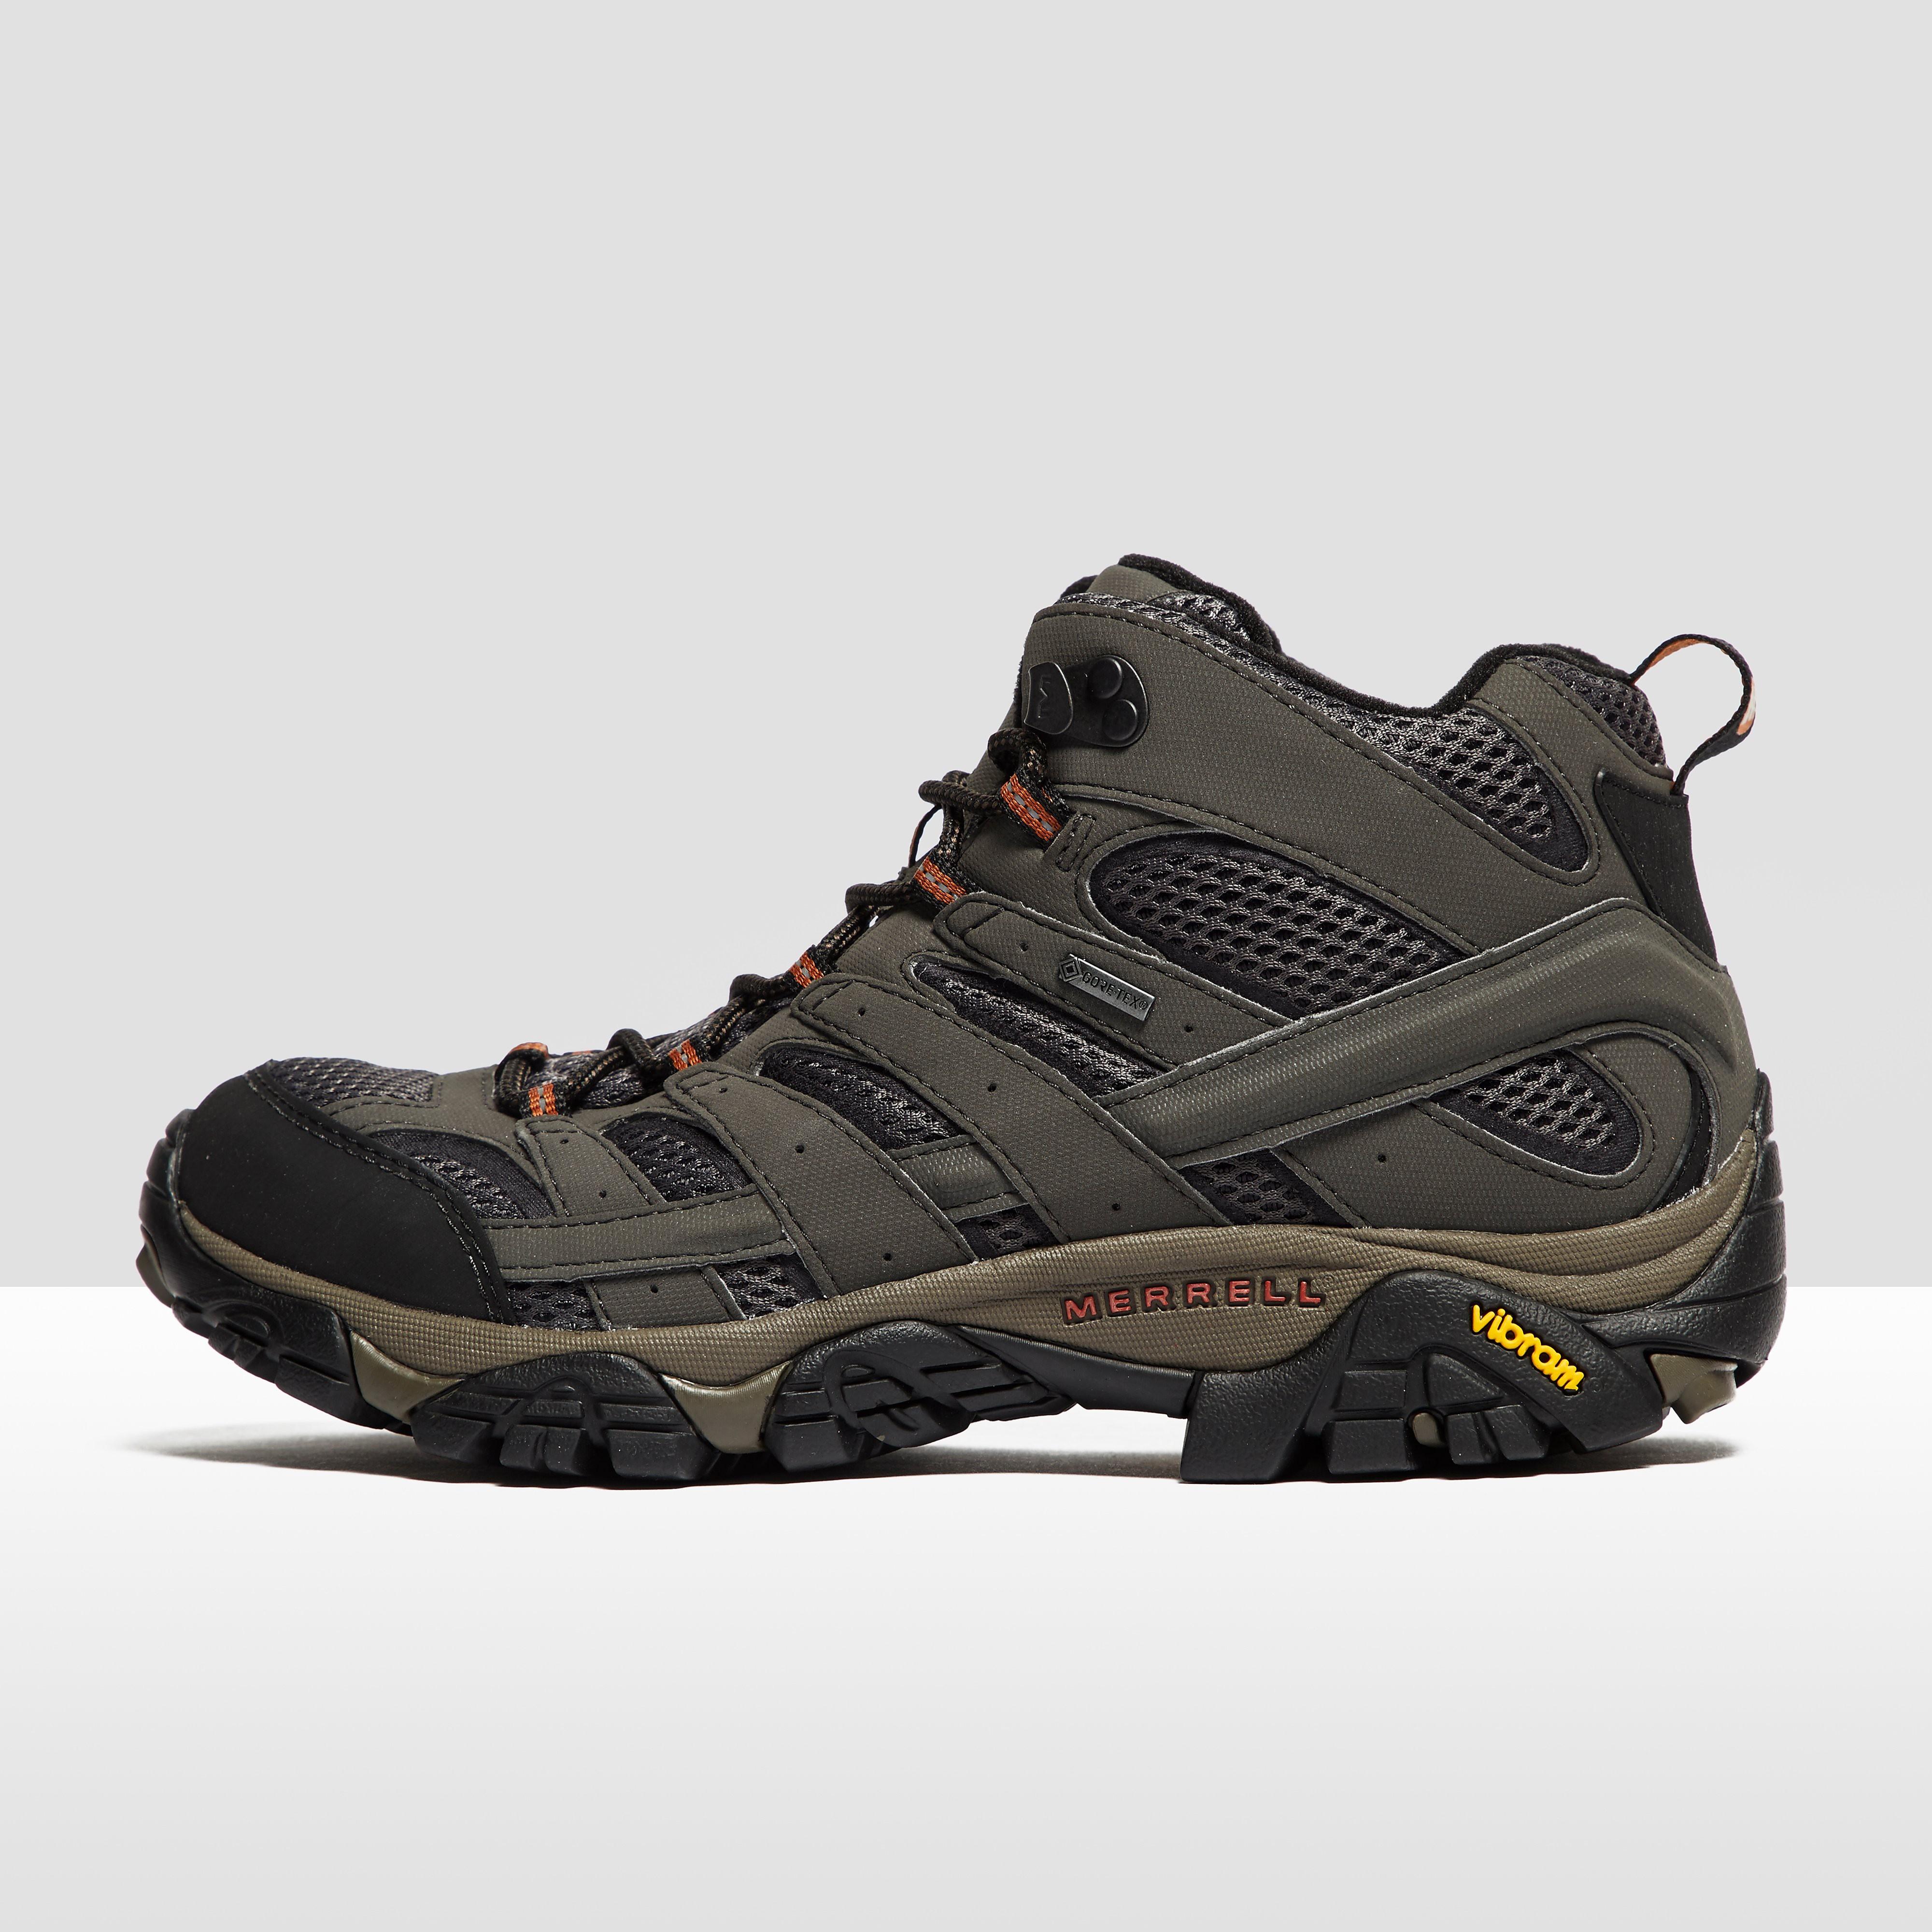 Merrell MOAB 2 MID GORE-TEX Men's Hiking Boots